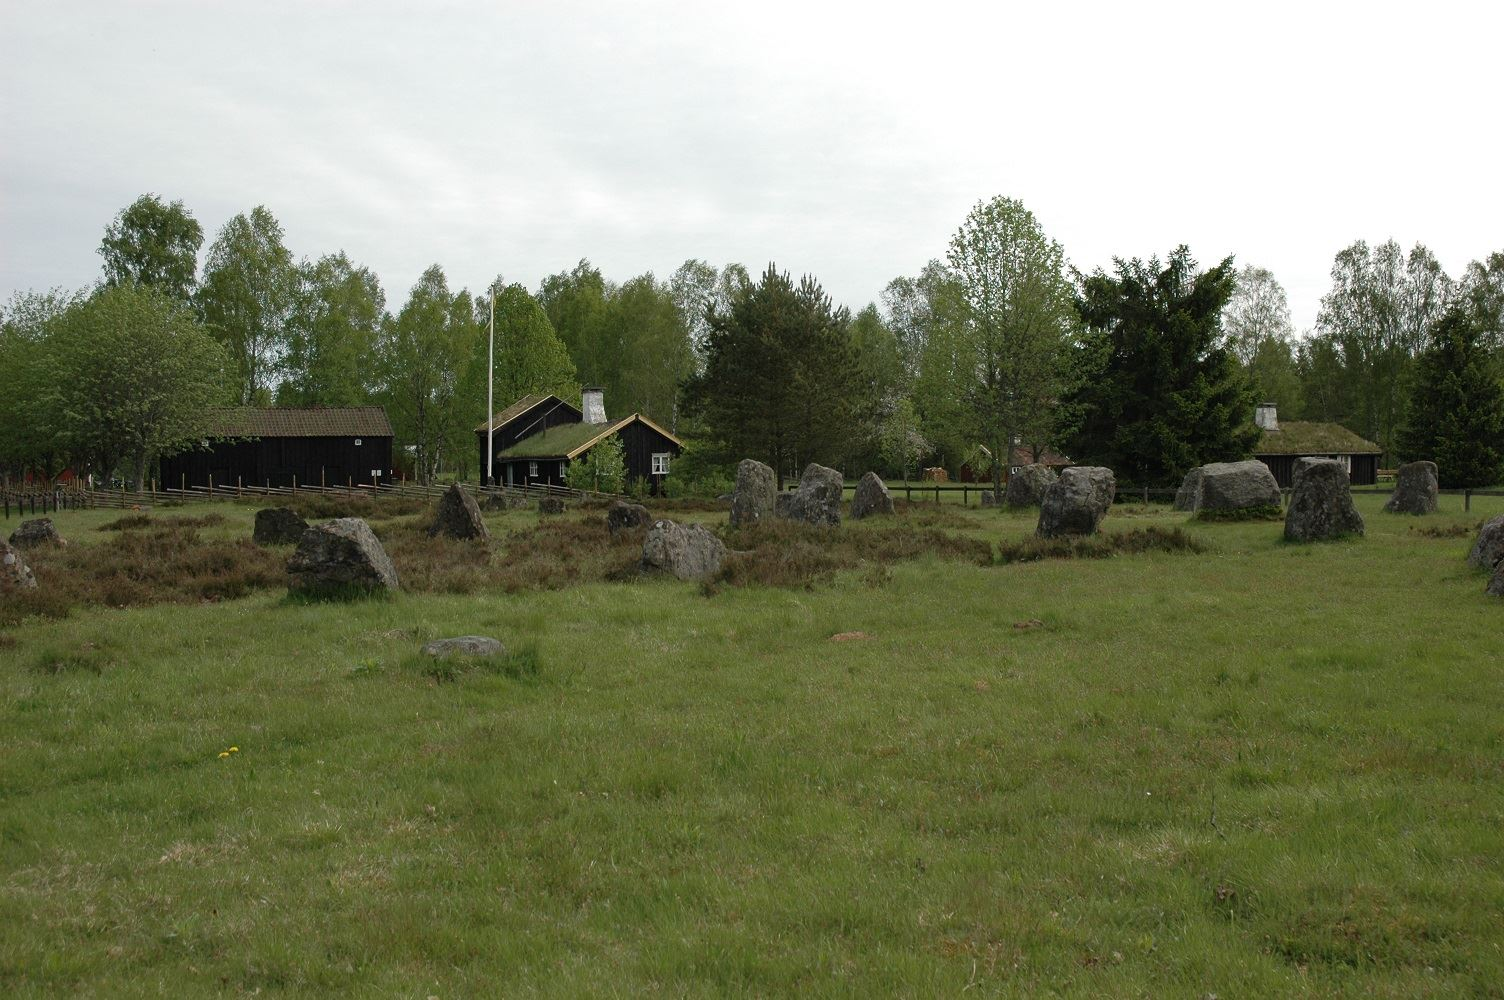 Gislaveds kommun,  © Gislaveds kommun, Domarringarna i Smålandsstenar